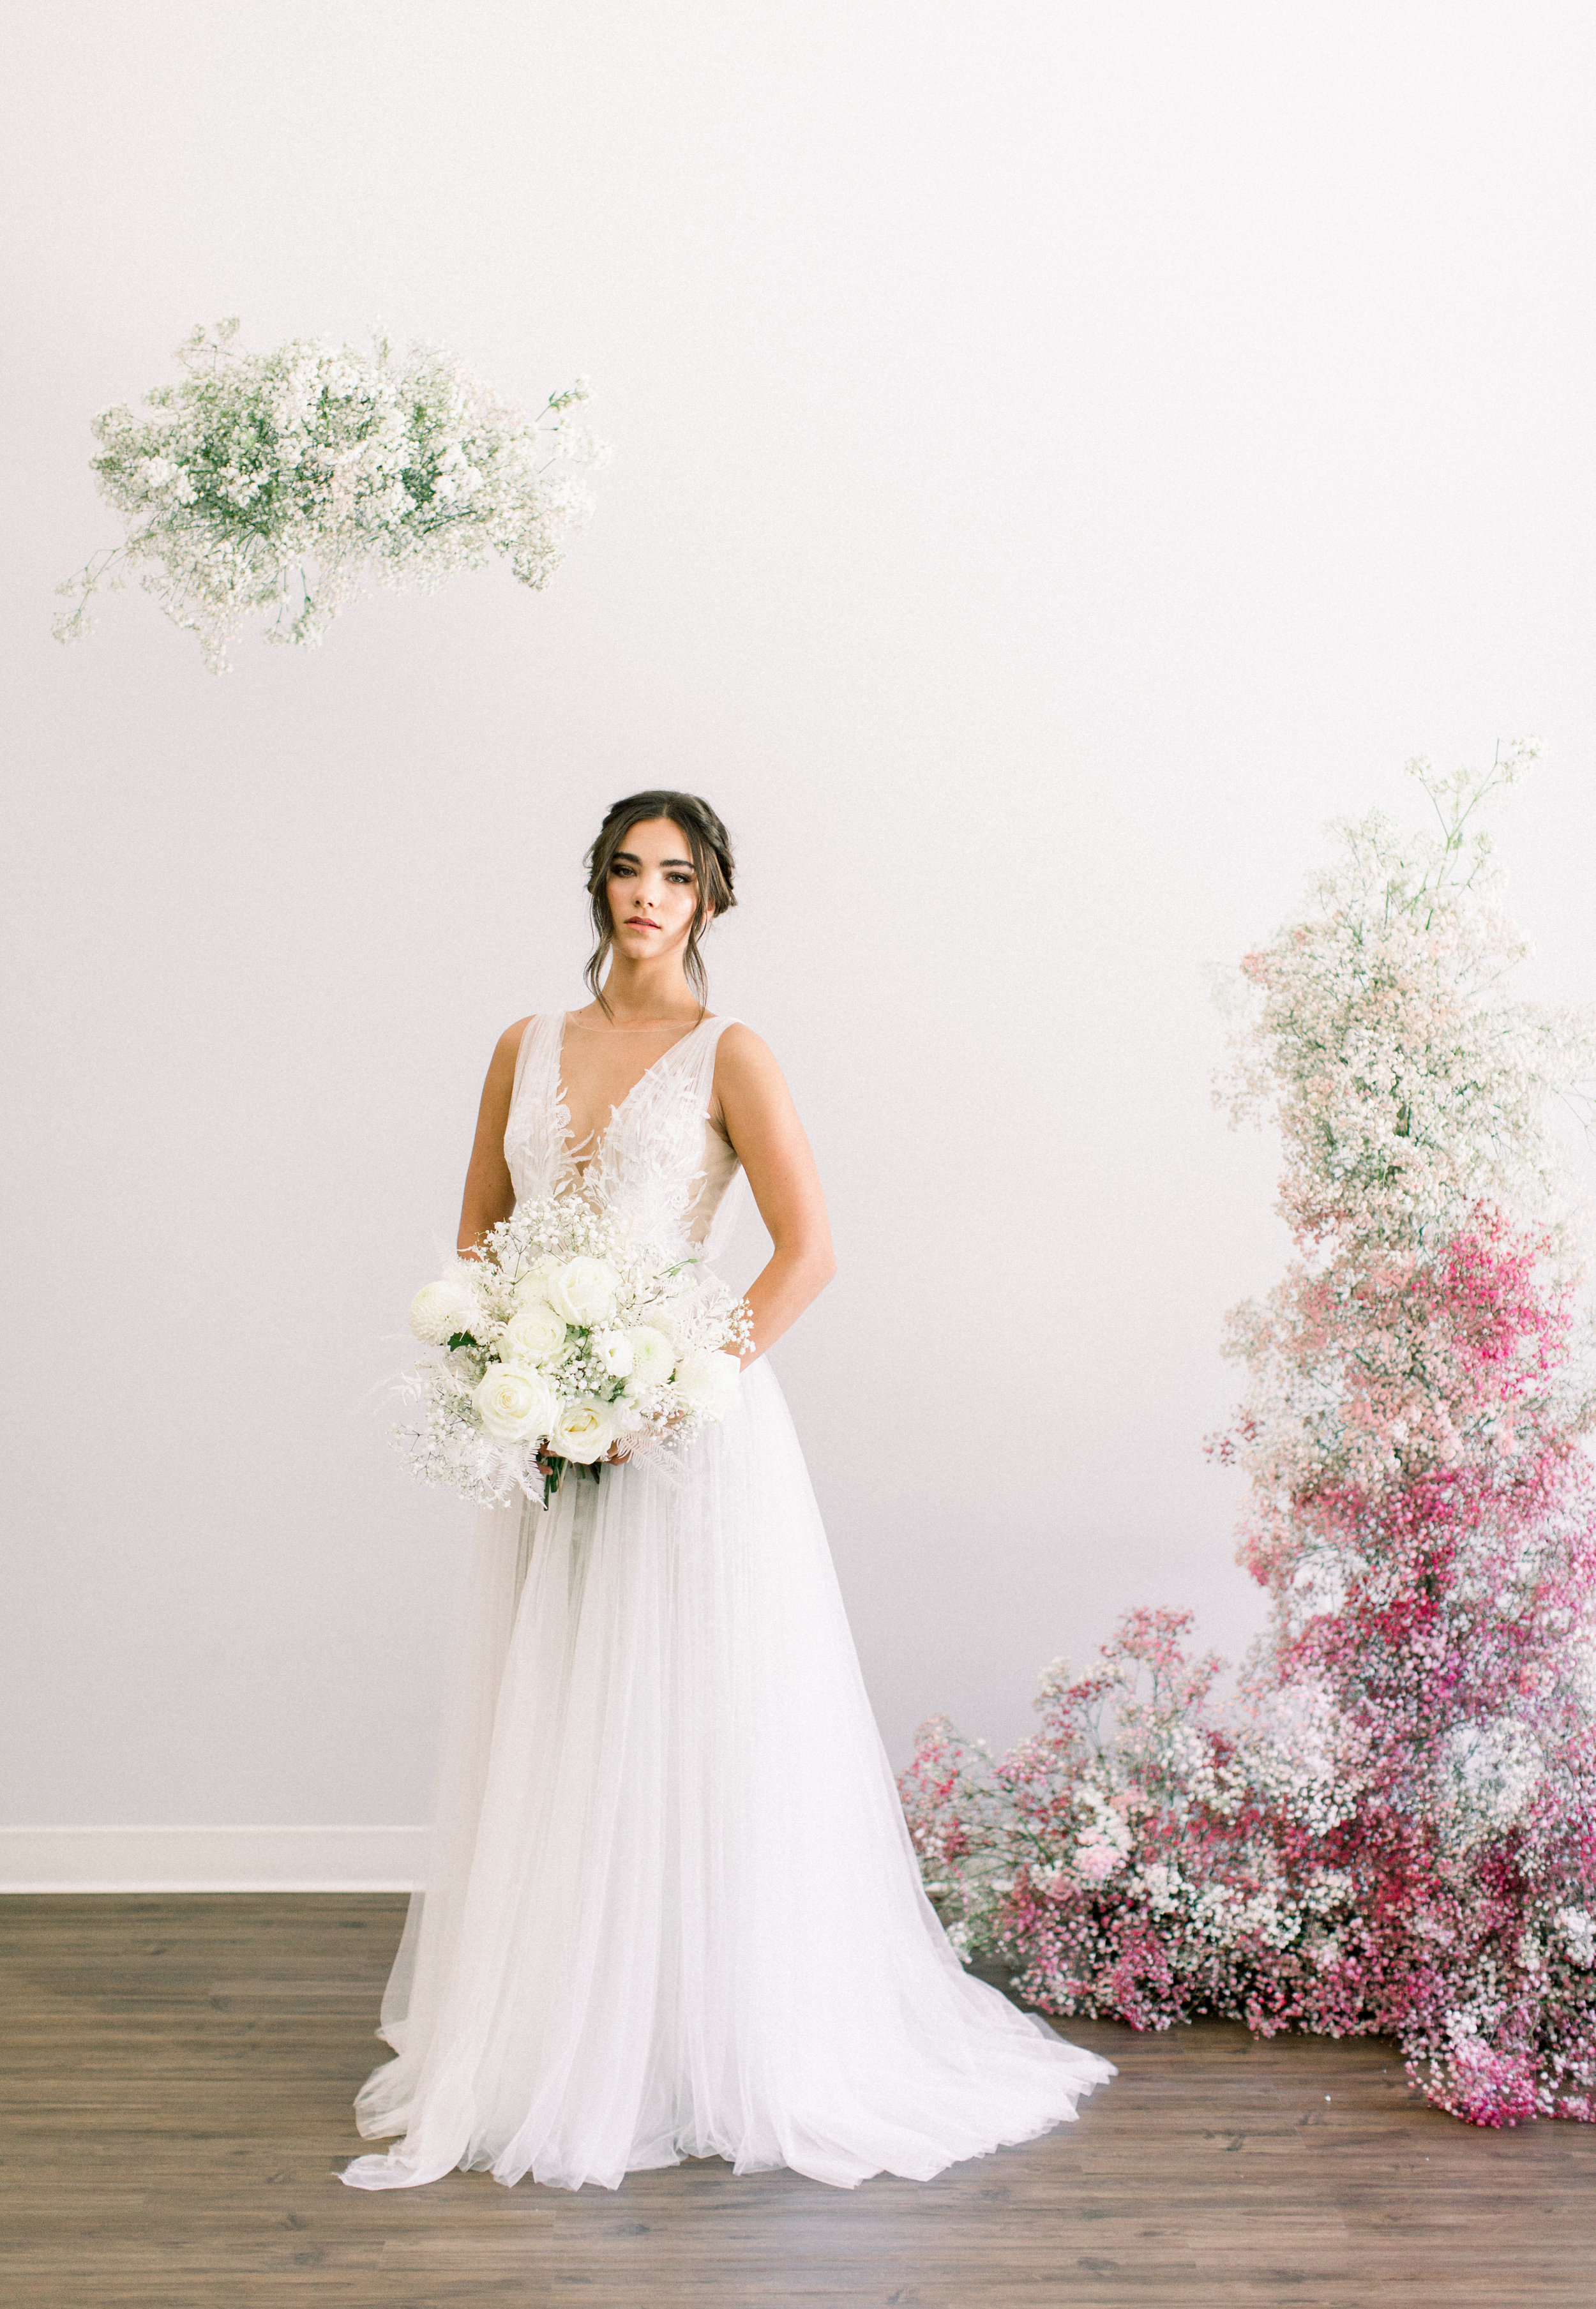 Bridal Gown Lookbook - Arizona florist Phoenix Scottsdale Sedona - Babies Breath Ombre Installation